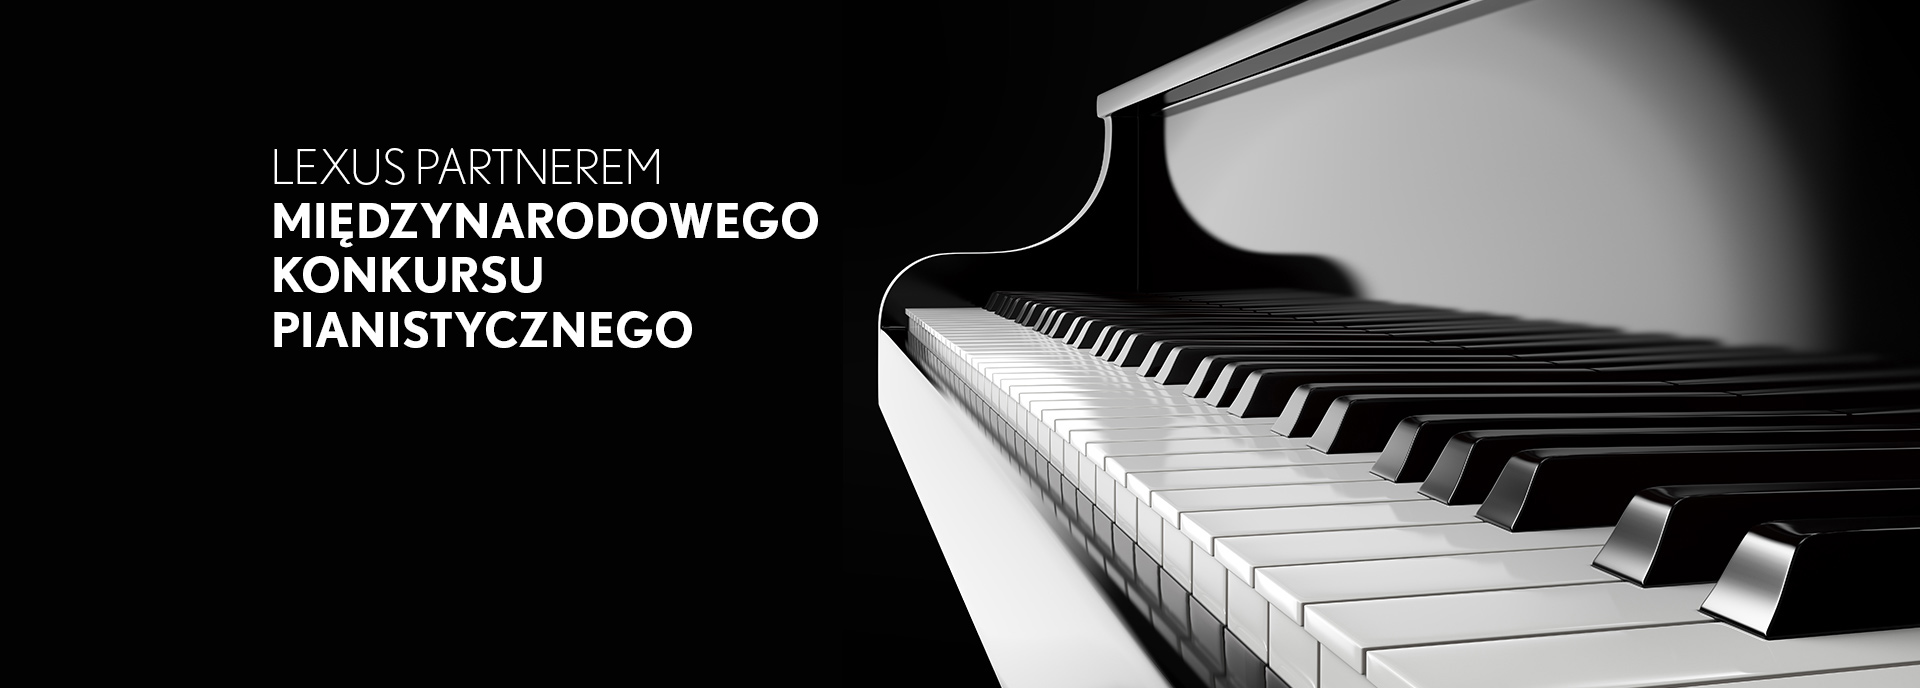 partner konkursu pianistycznego hero